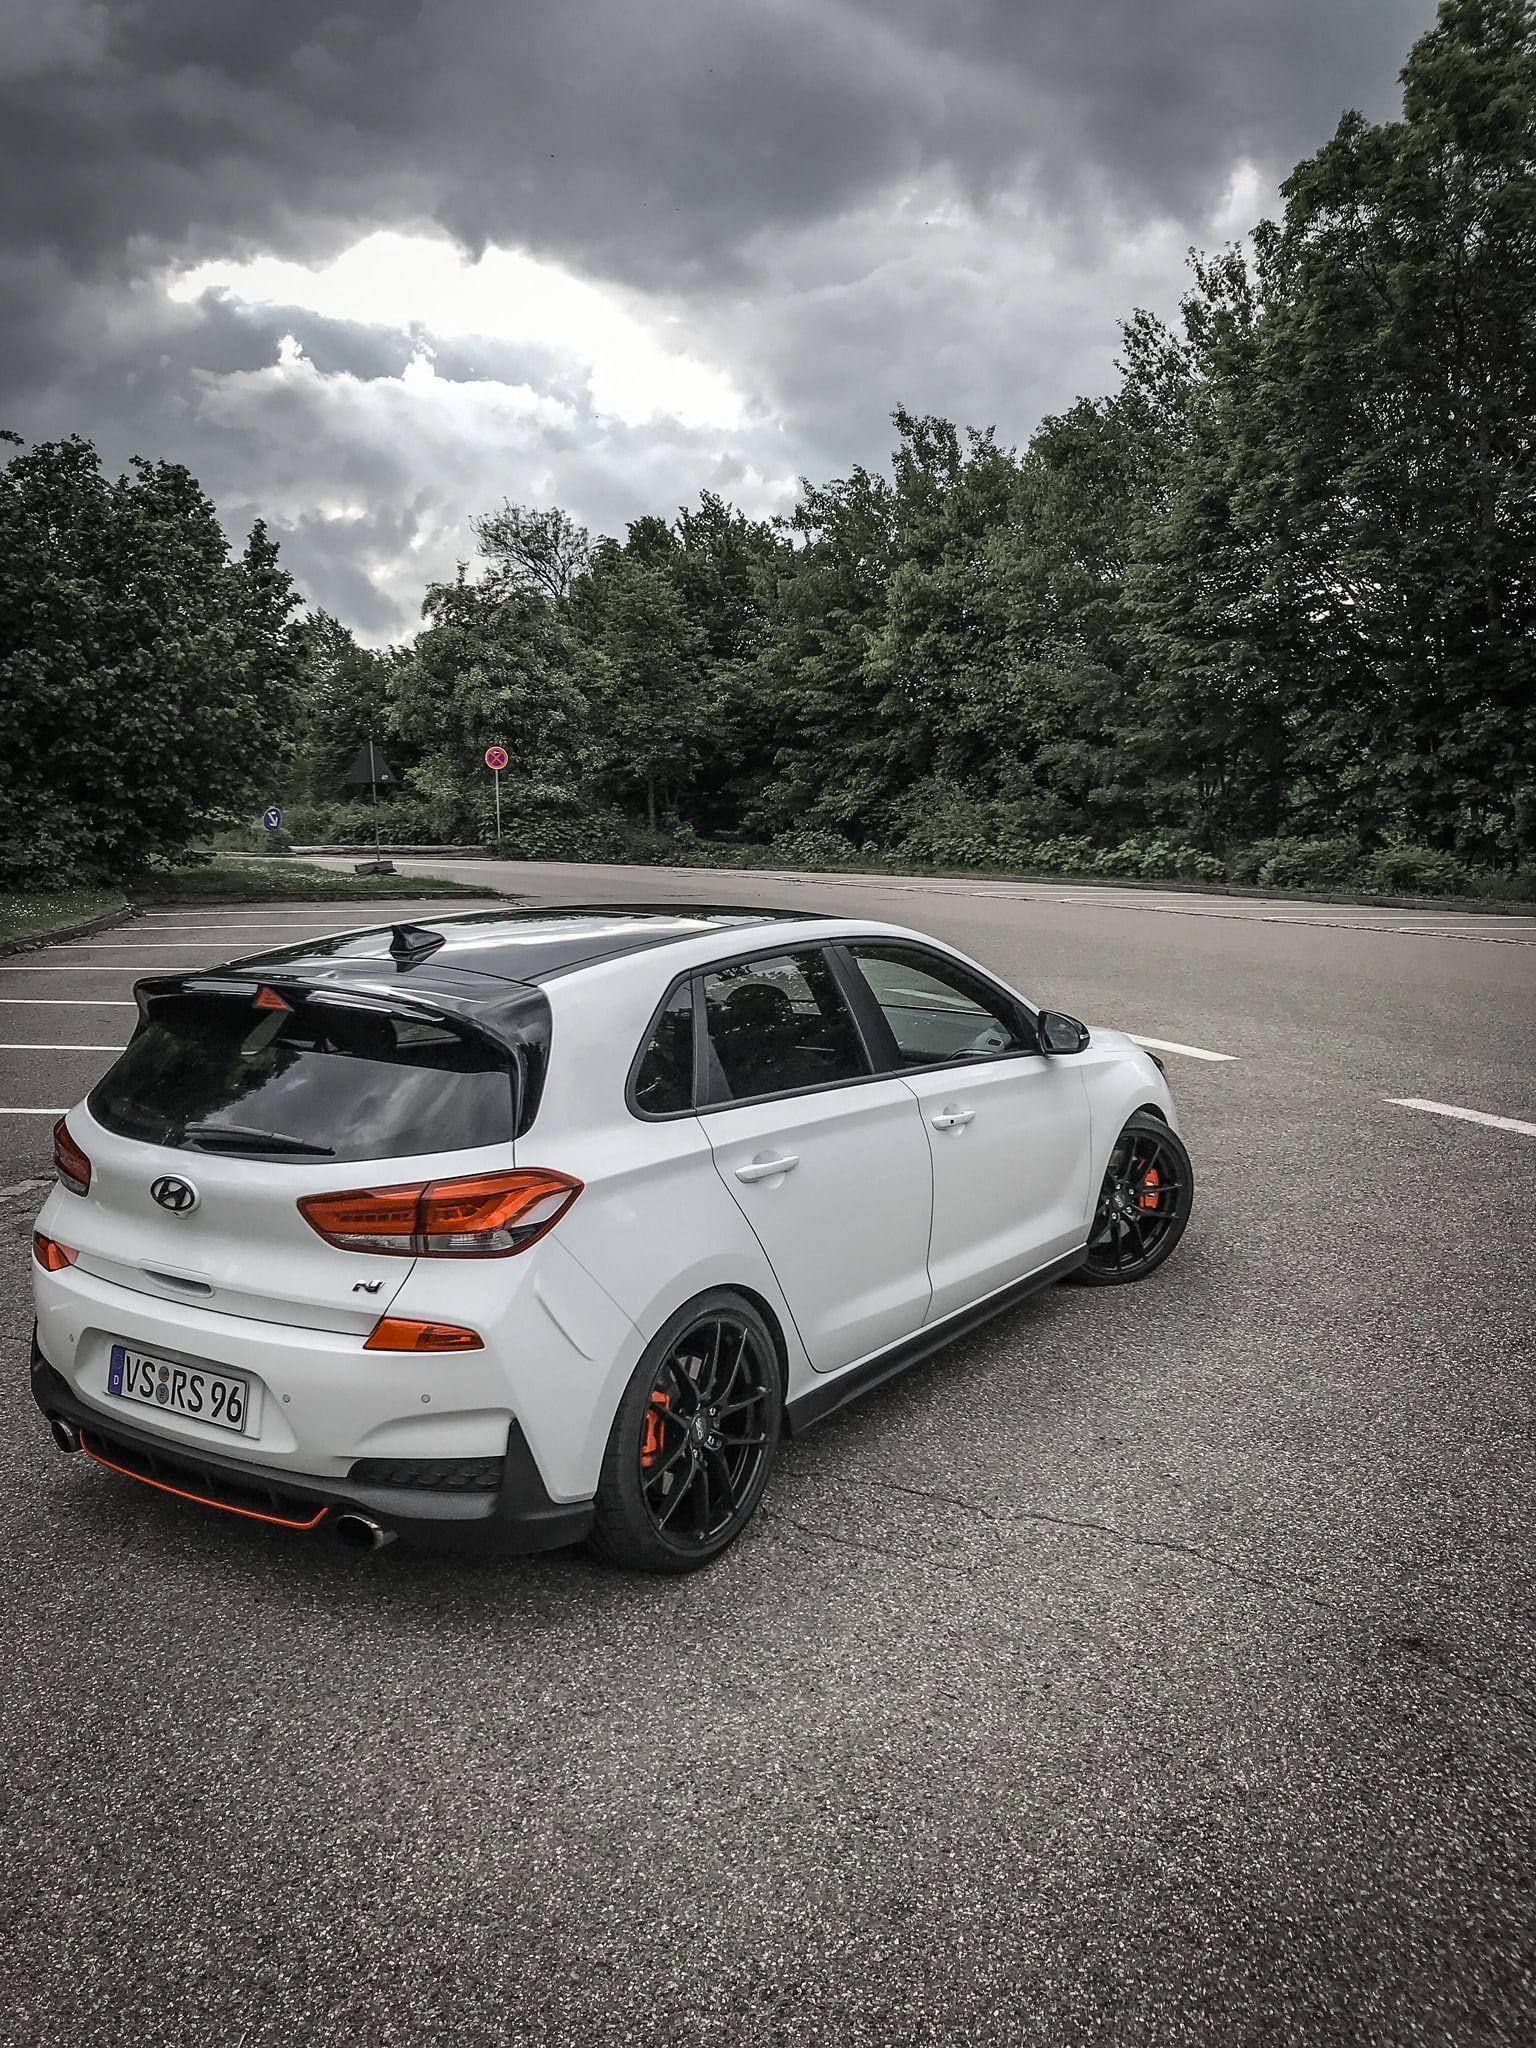 I30n Hyundai Hatchbacks Car Hot Hatch Rear Angle View 1080p Wallpaper Hdwallpaper Desktop In 2020 Hot Hatch Hatchback Car